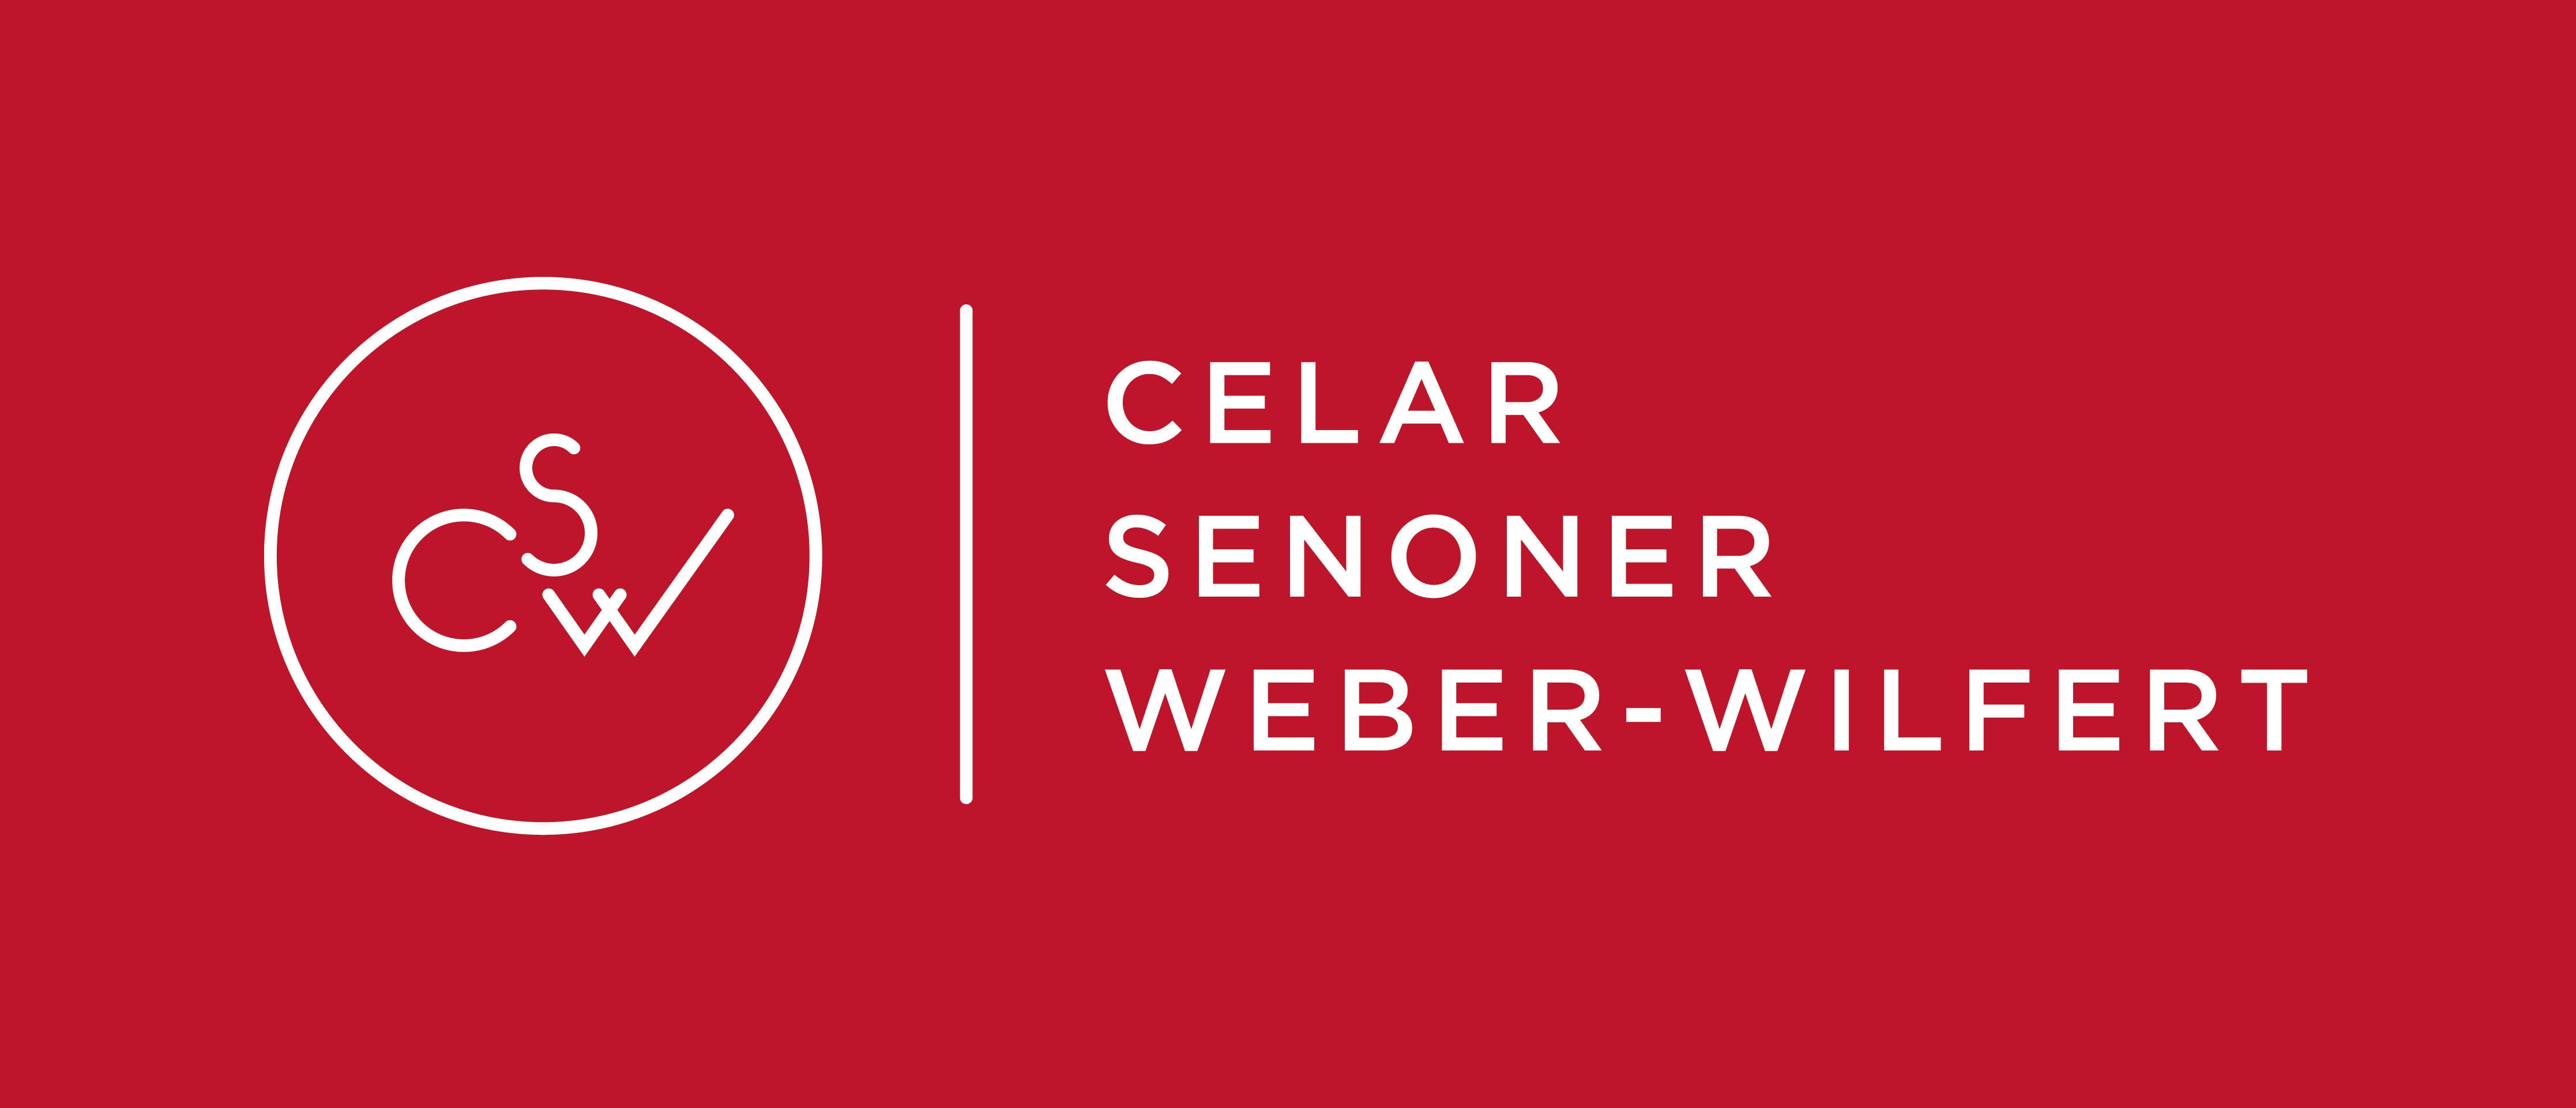 Celar Senoner Weber-Wilfert Rechtsanwälte GmbH Logo